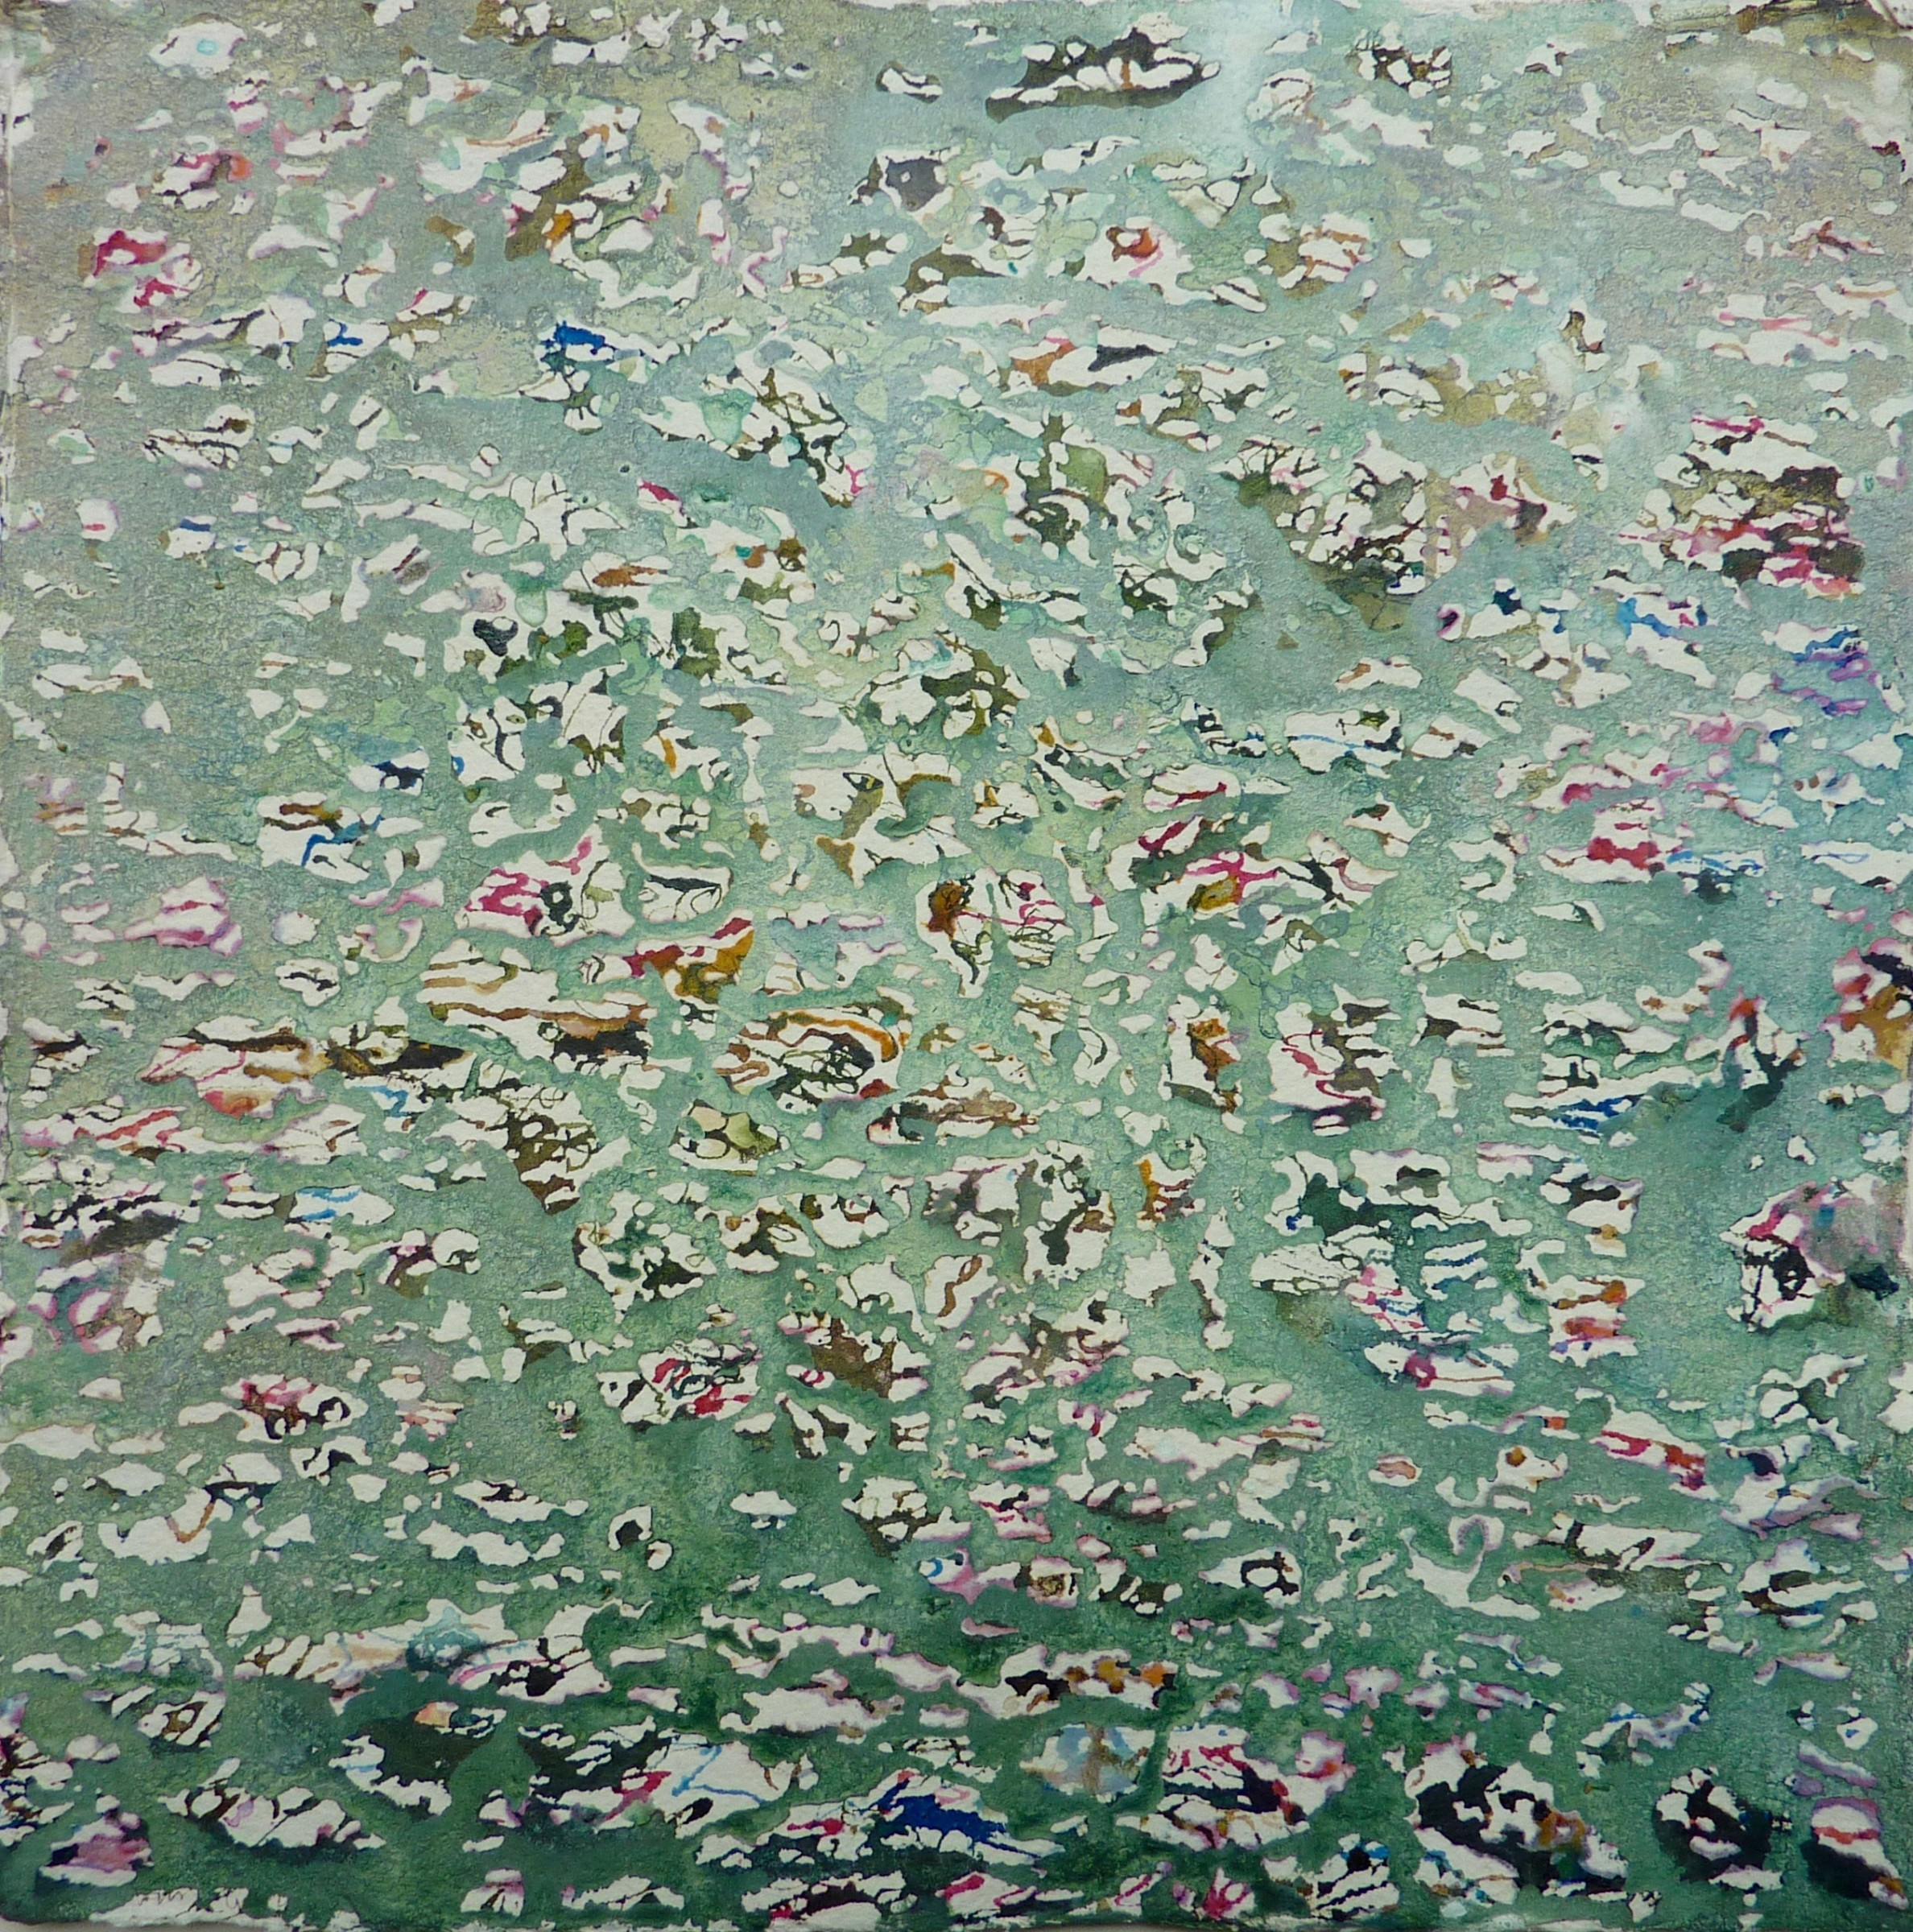 <span class=&#34;link fancybox-details-link&#34;><a href=&#34;/artists/71-luke-elwes/works/891/&#34;>View Detail Page</a></span><div class=&#34;artist&#34;><strong>Luke Elwes</strong></div> b.1965 <div class=&#34;title&#34;><em>Waterline study 11</em>, 2017</div> <div class=&#34;medium&#34;>watercolour on paper </div> <div class=&#34;dimensions&#34;>30 x 30cm</div><div class=&#34;copyright_line&#34;>Copyright the artist</div>